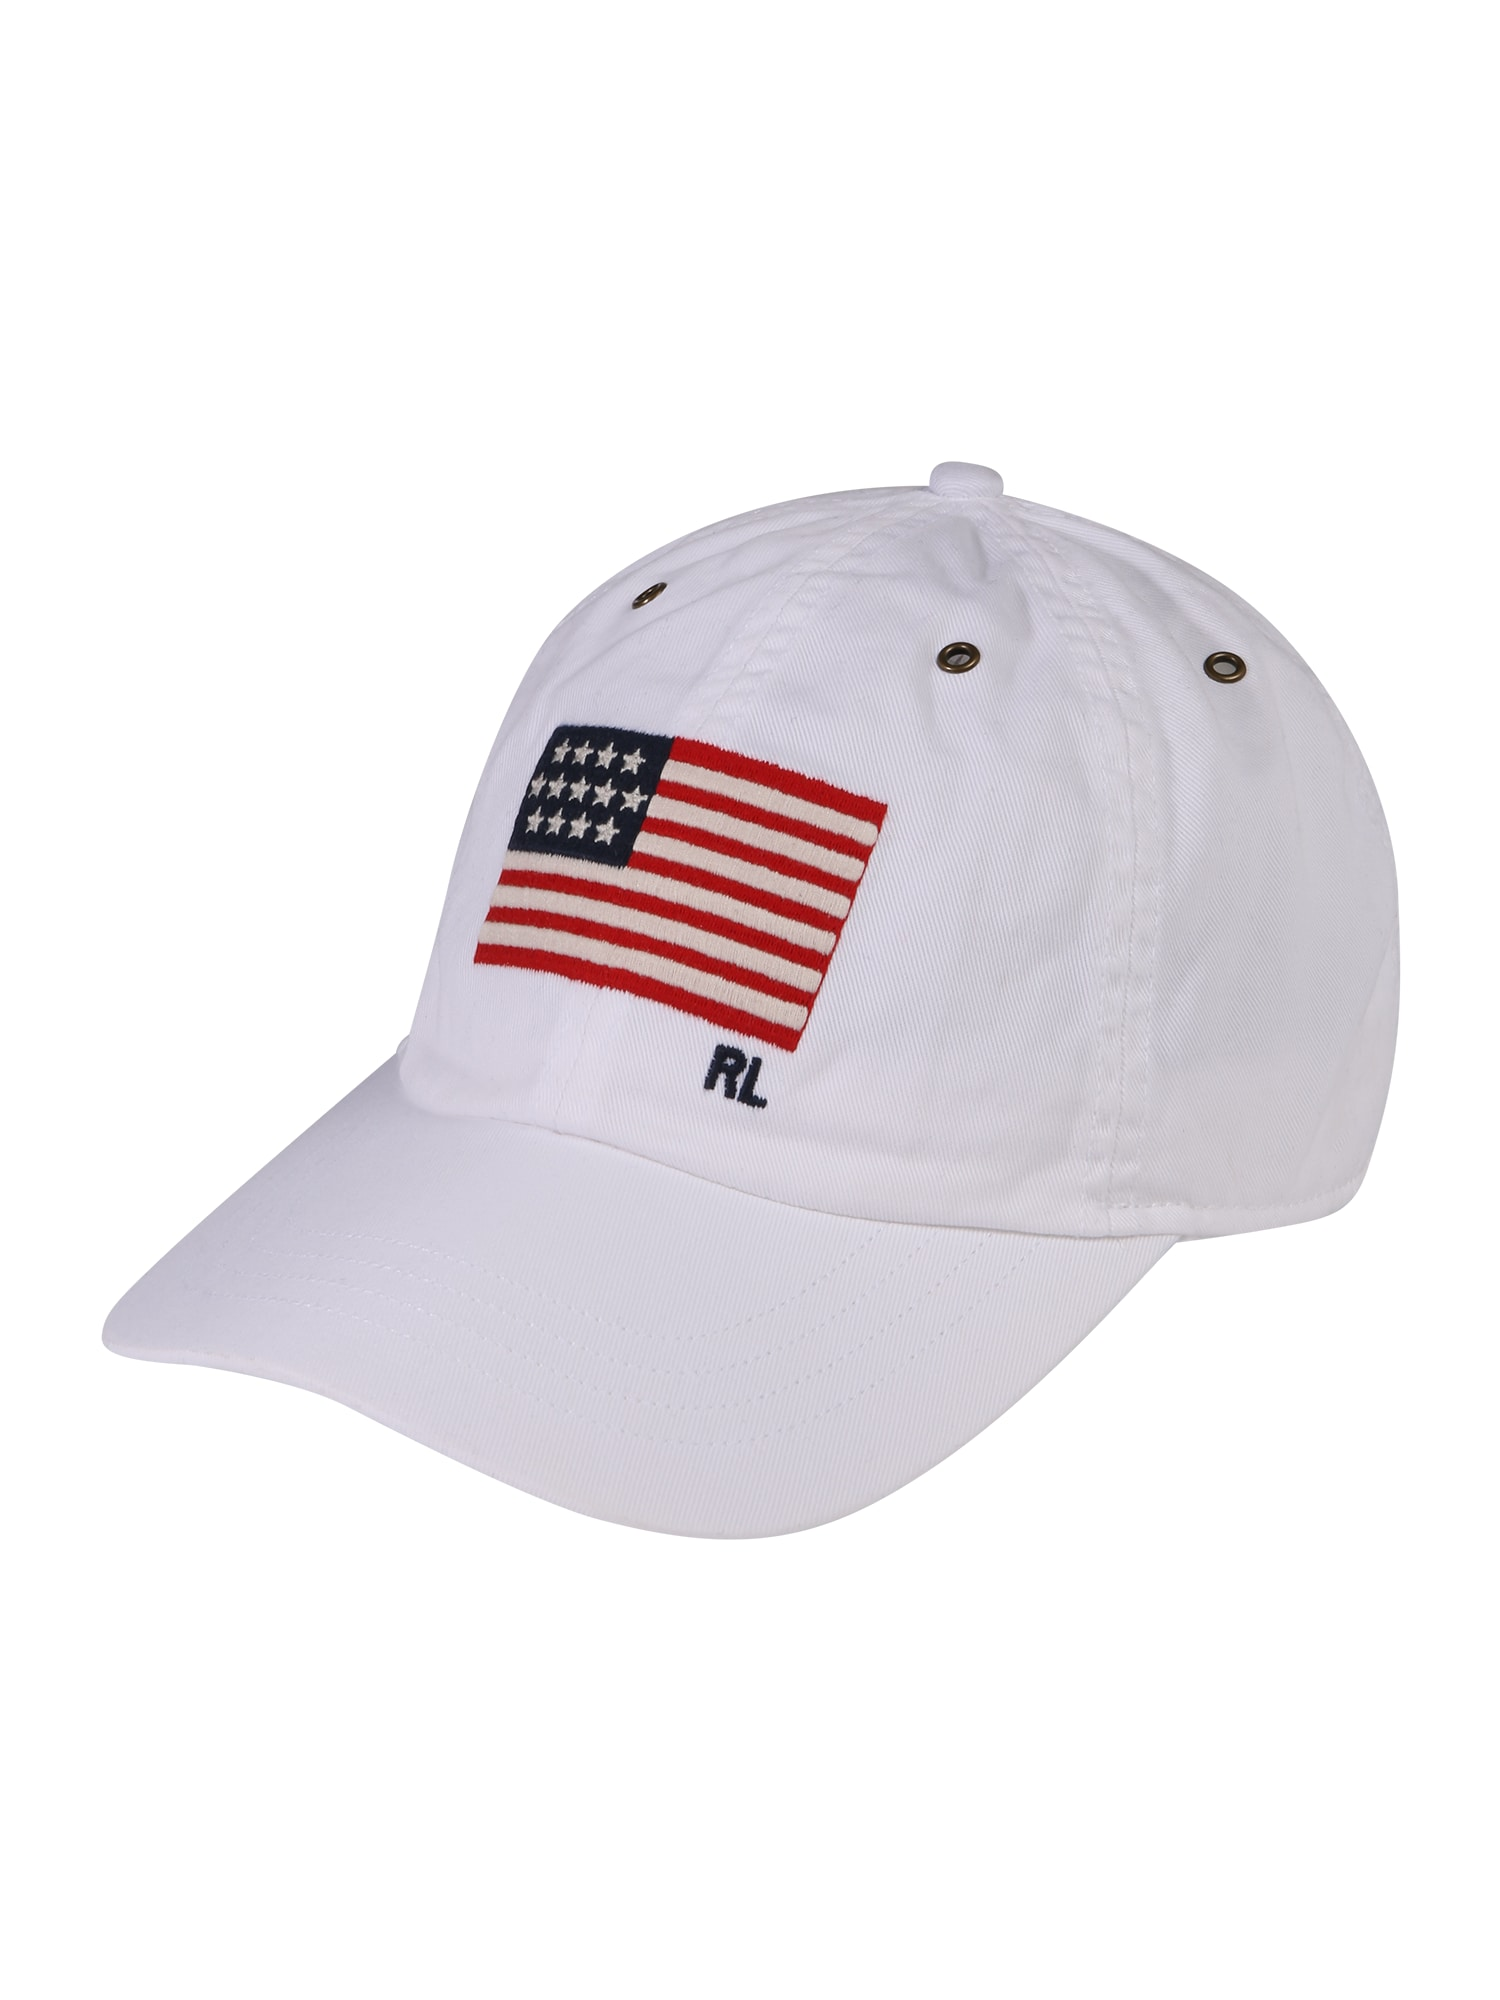 Kšiltovka COTTON CHINO TWILL-ICONIC CAP modrá červená bílá POLO RALPH LAUREN